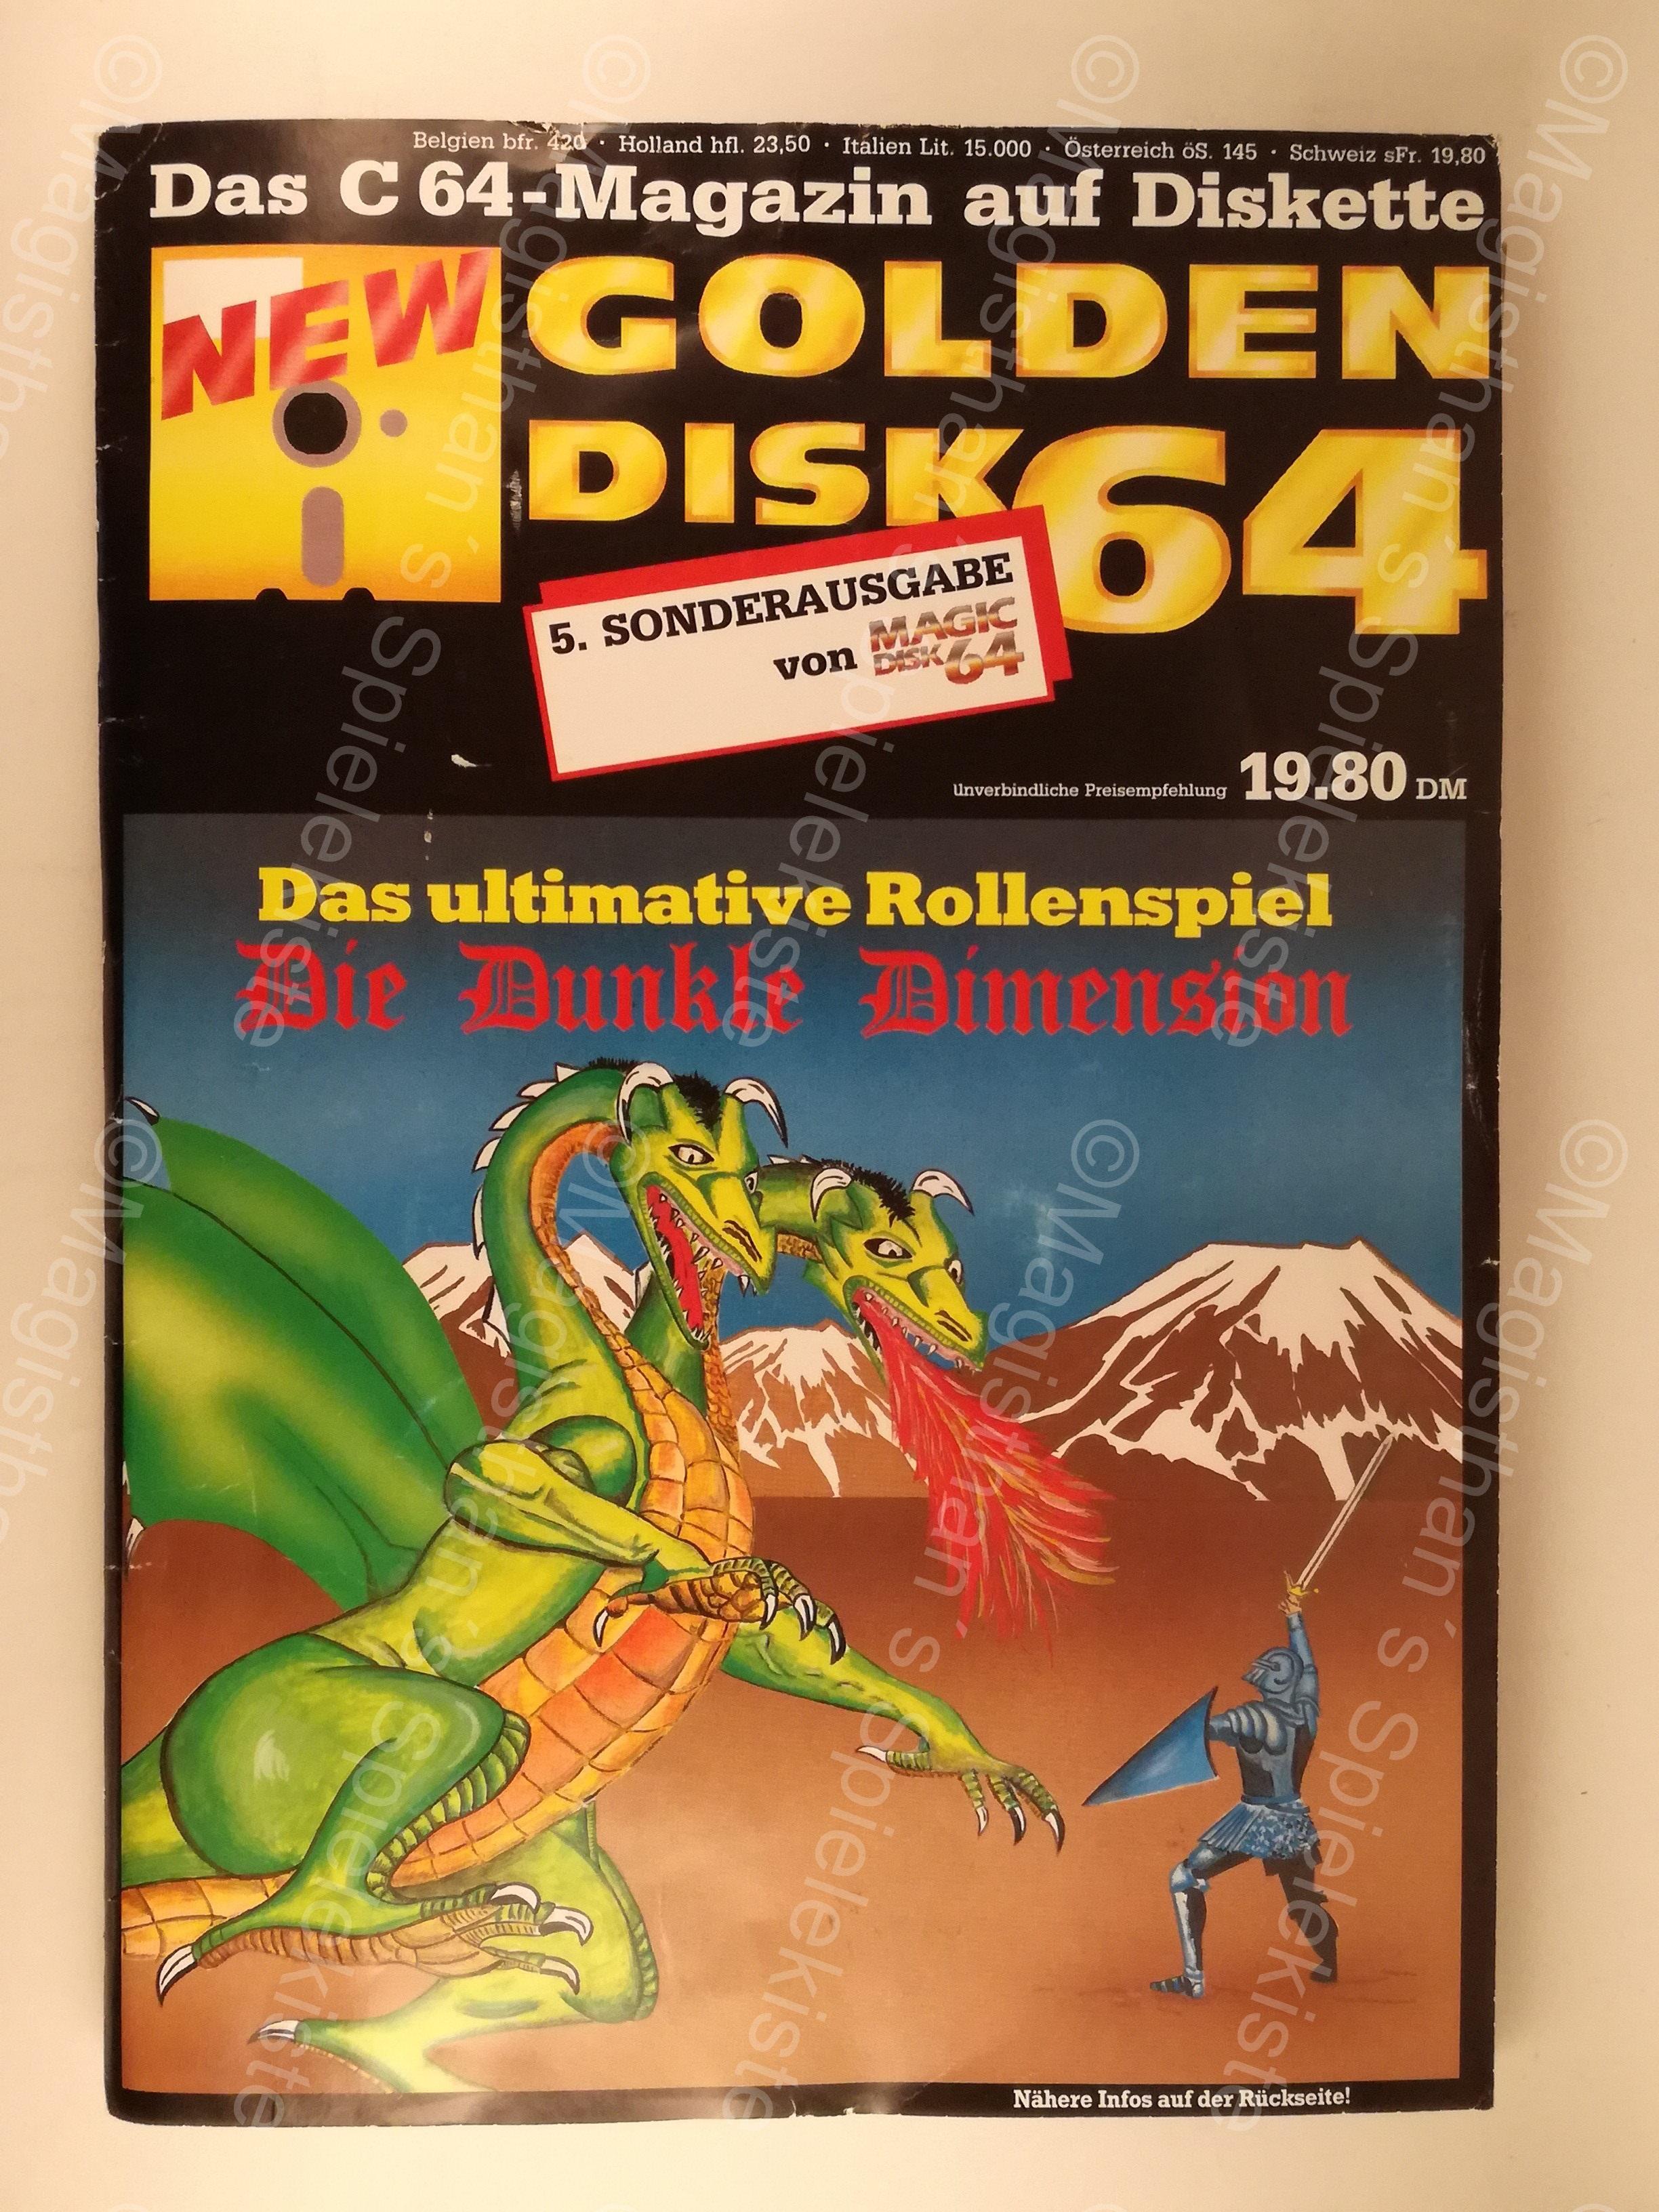 Die_Dunkle_Dimension_GoldenDisk1b.jpg